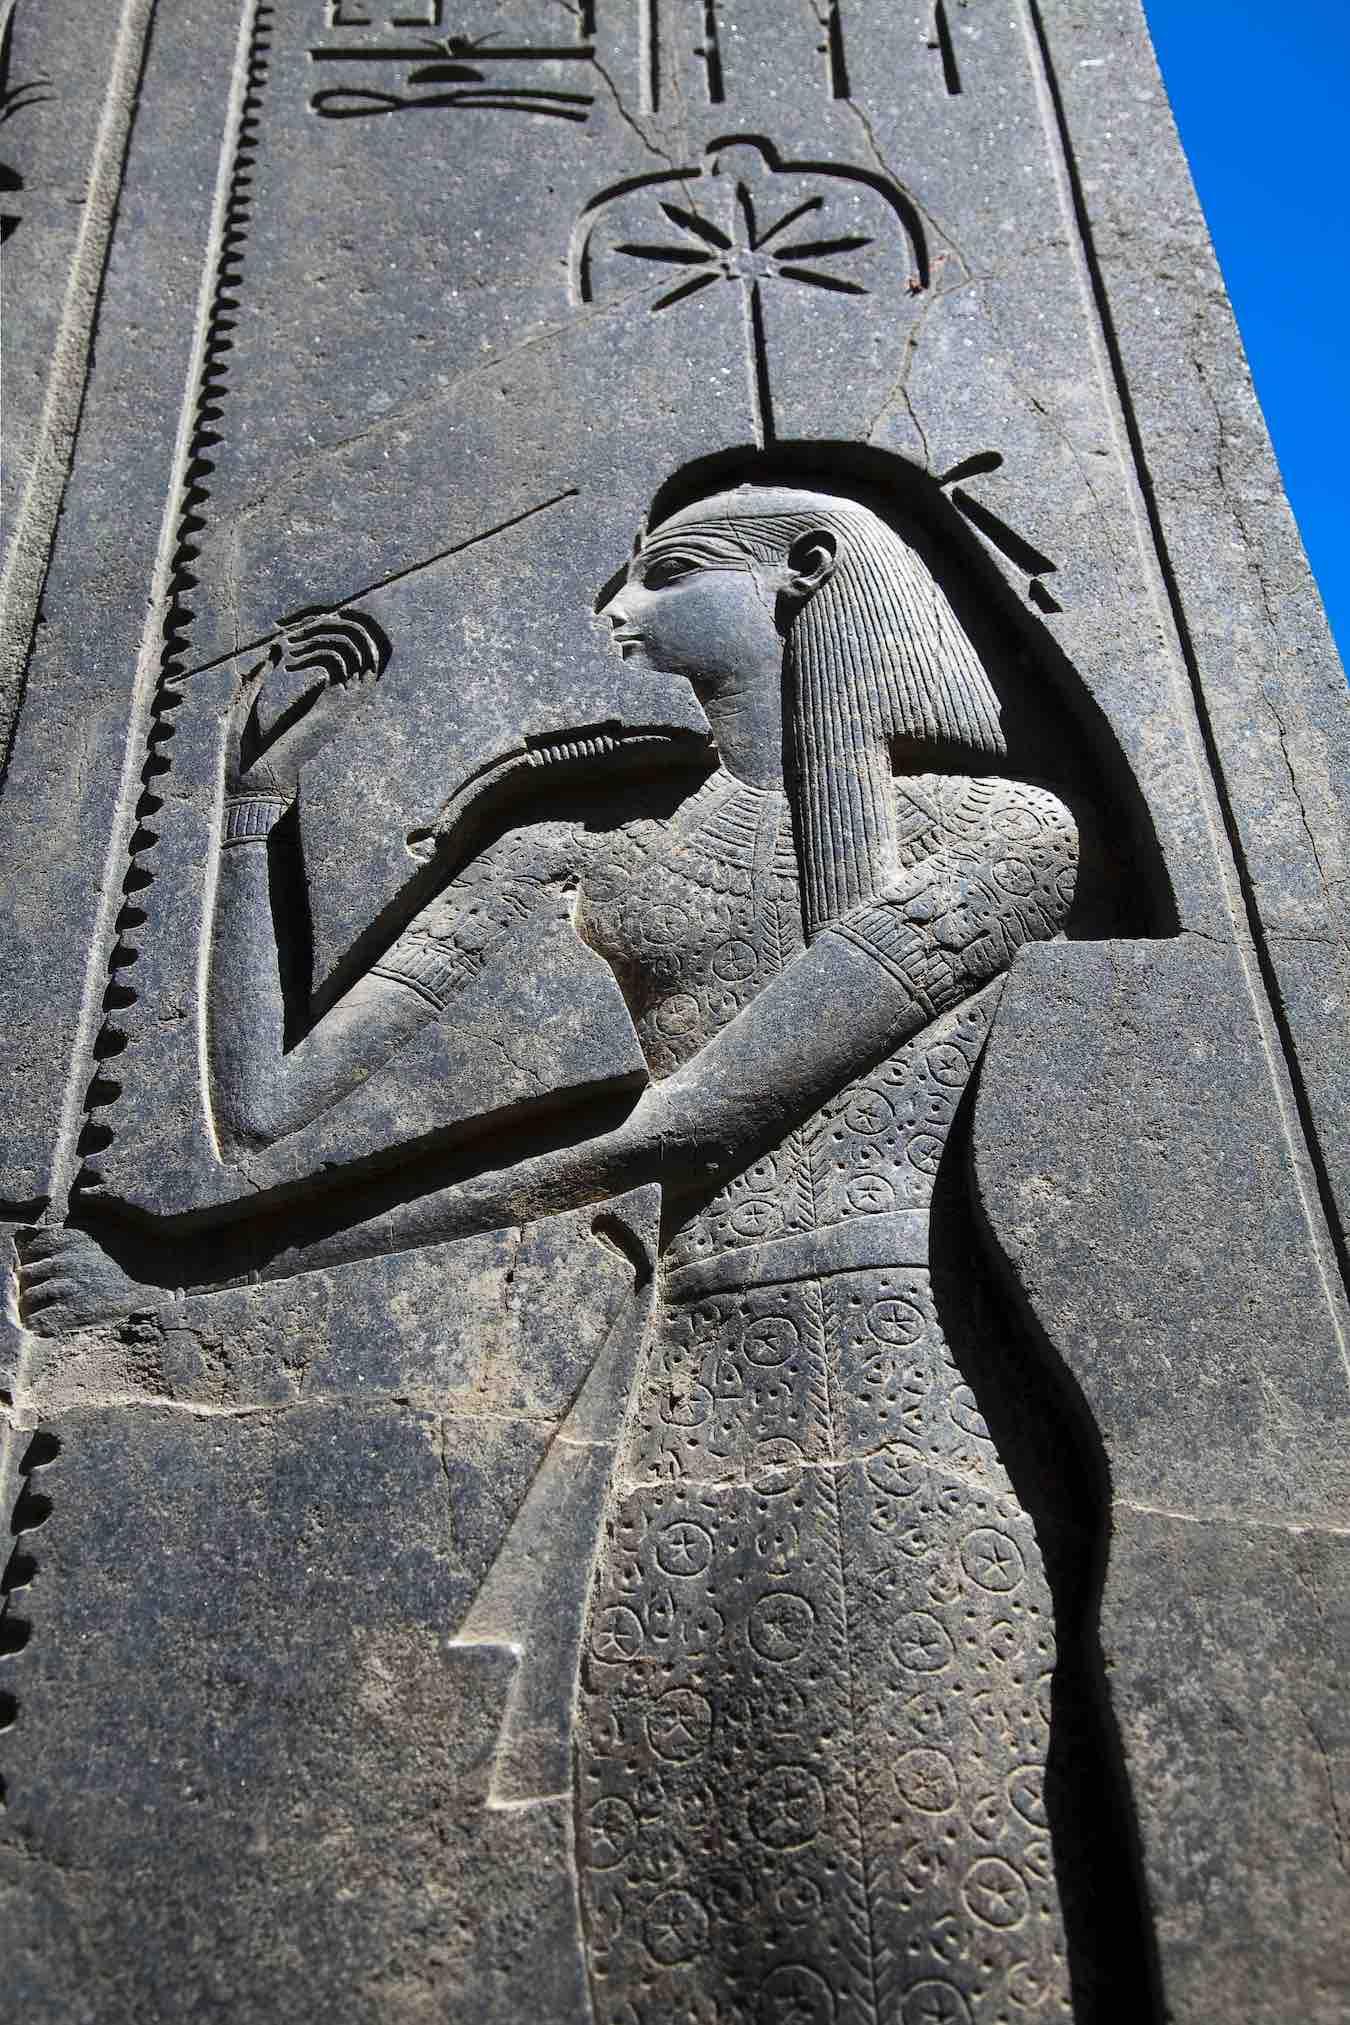 Seshet, egypt, medical cannabis